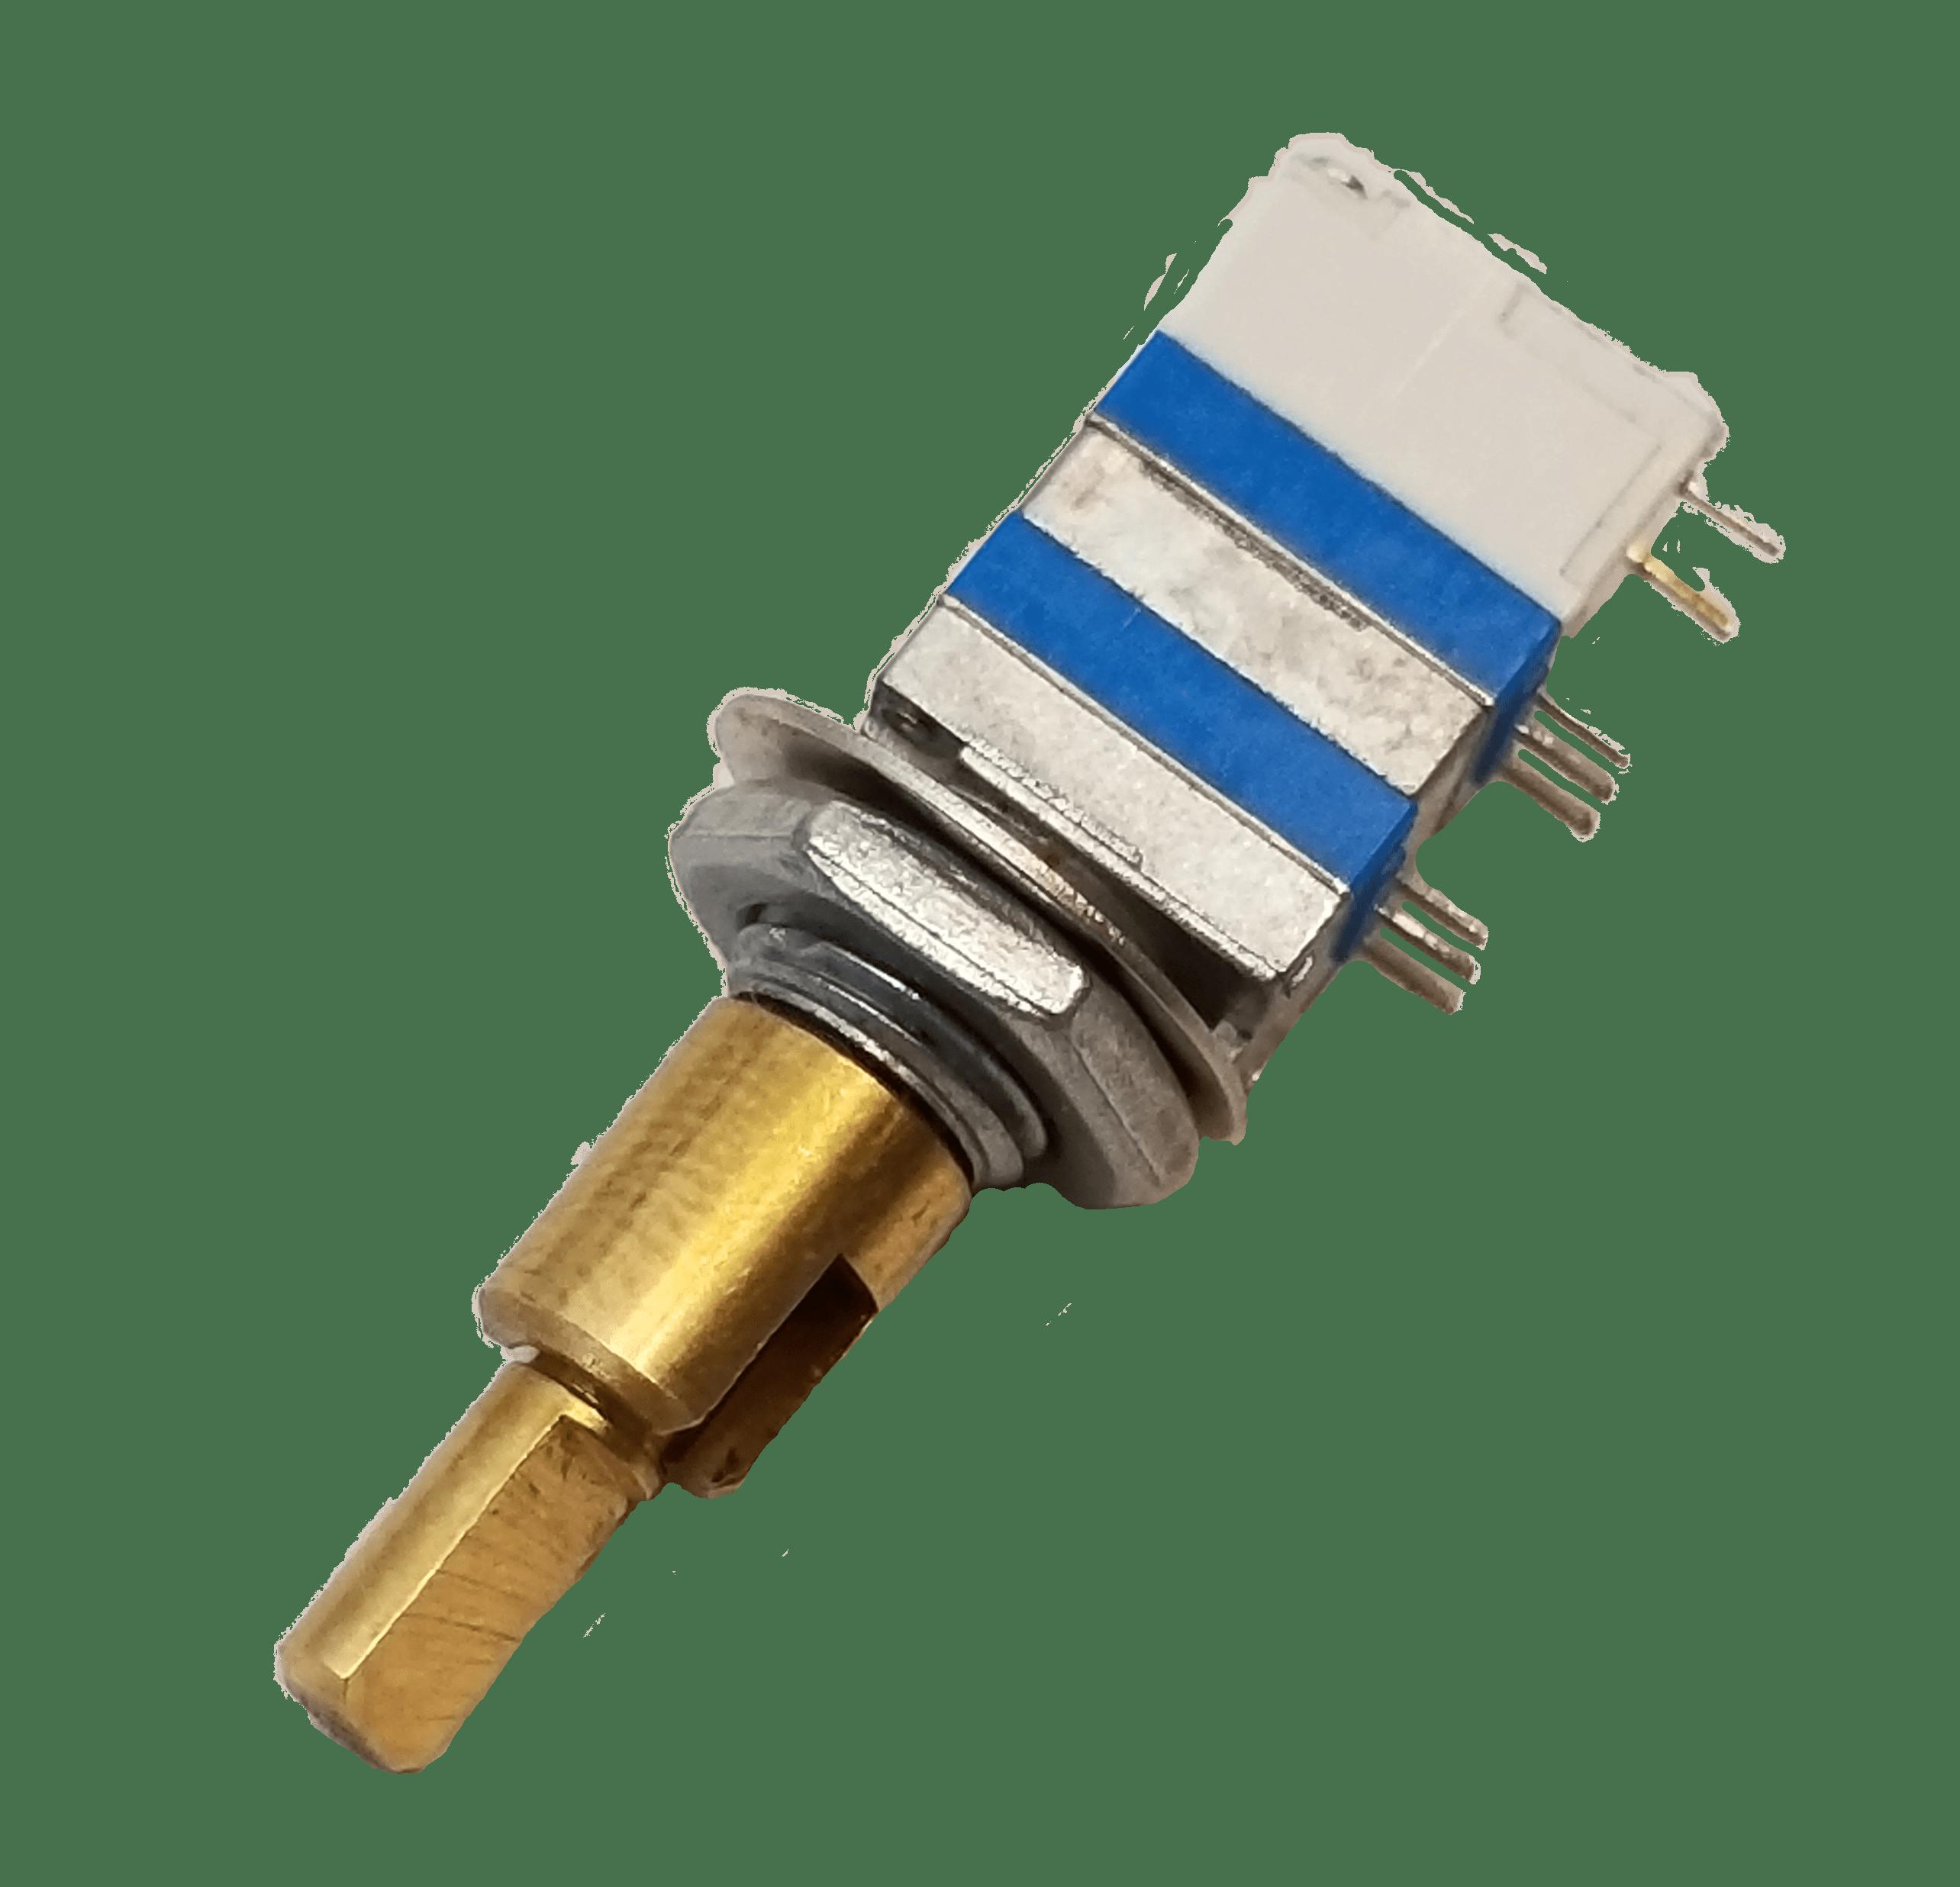 008046 - Cobra® On/Off Volume Control For Mrhh325 Radio